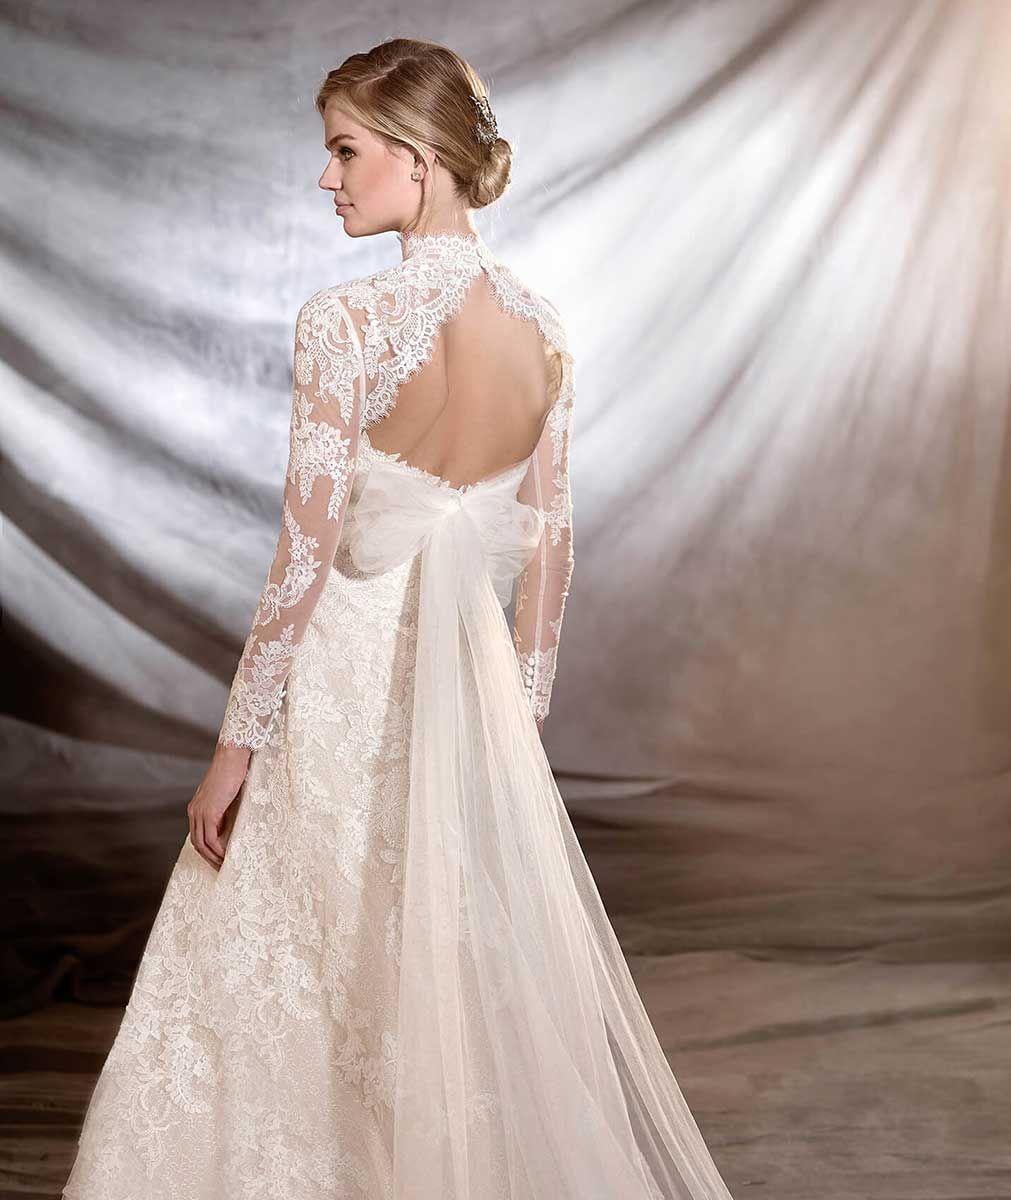 Pronovias Onia Wedding Dress Princess Style - Mia Sposa Bridal ...